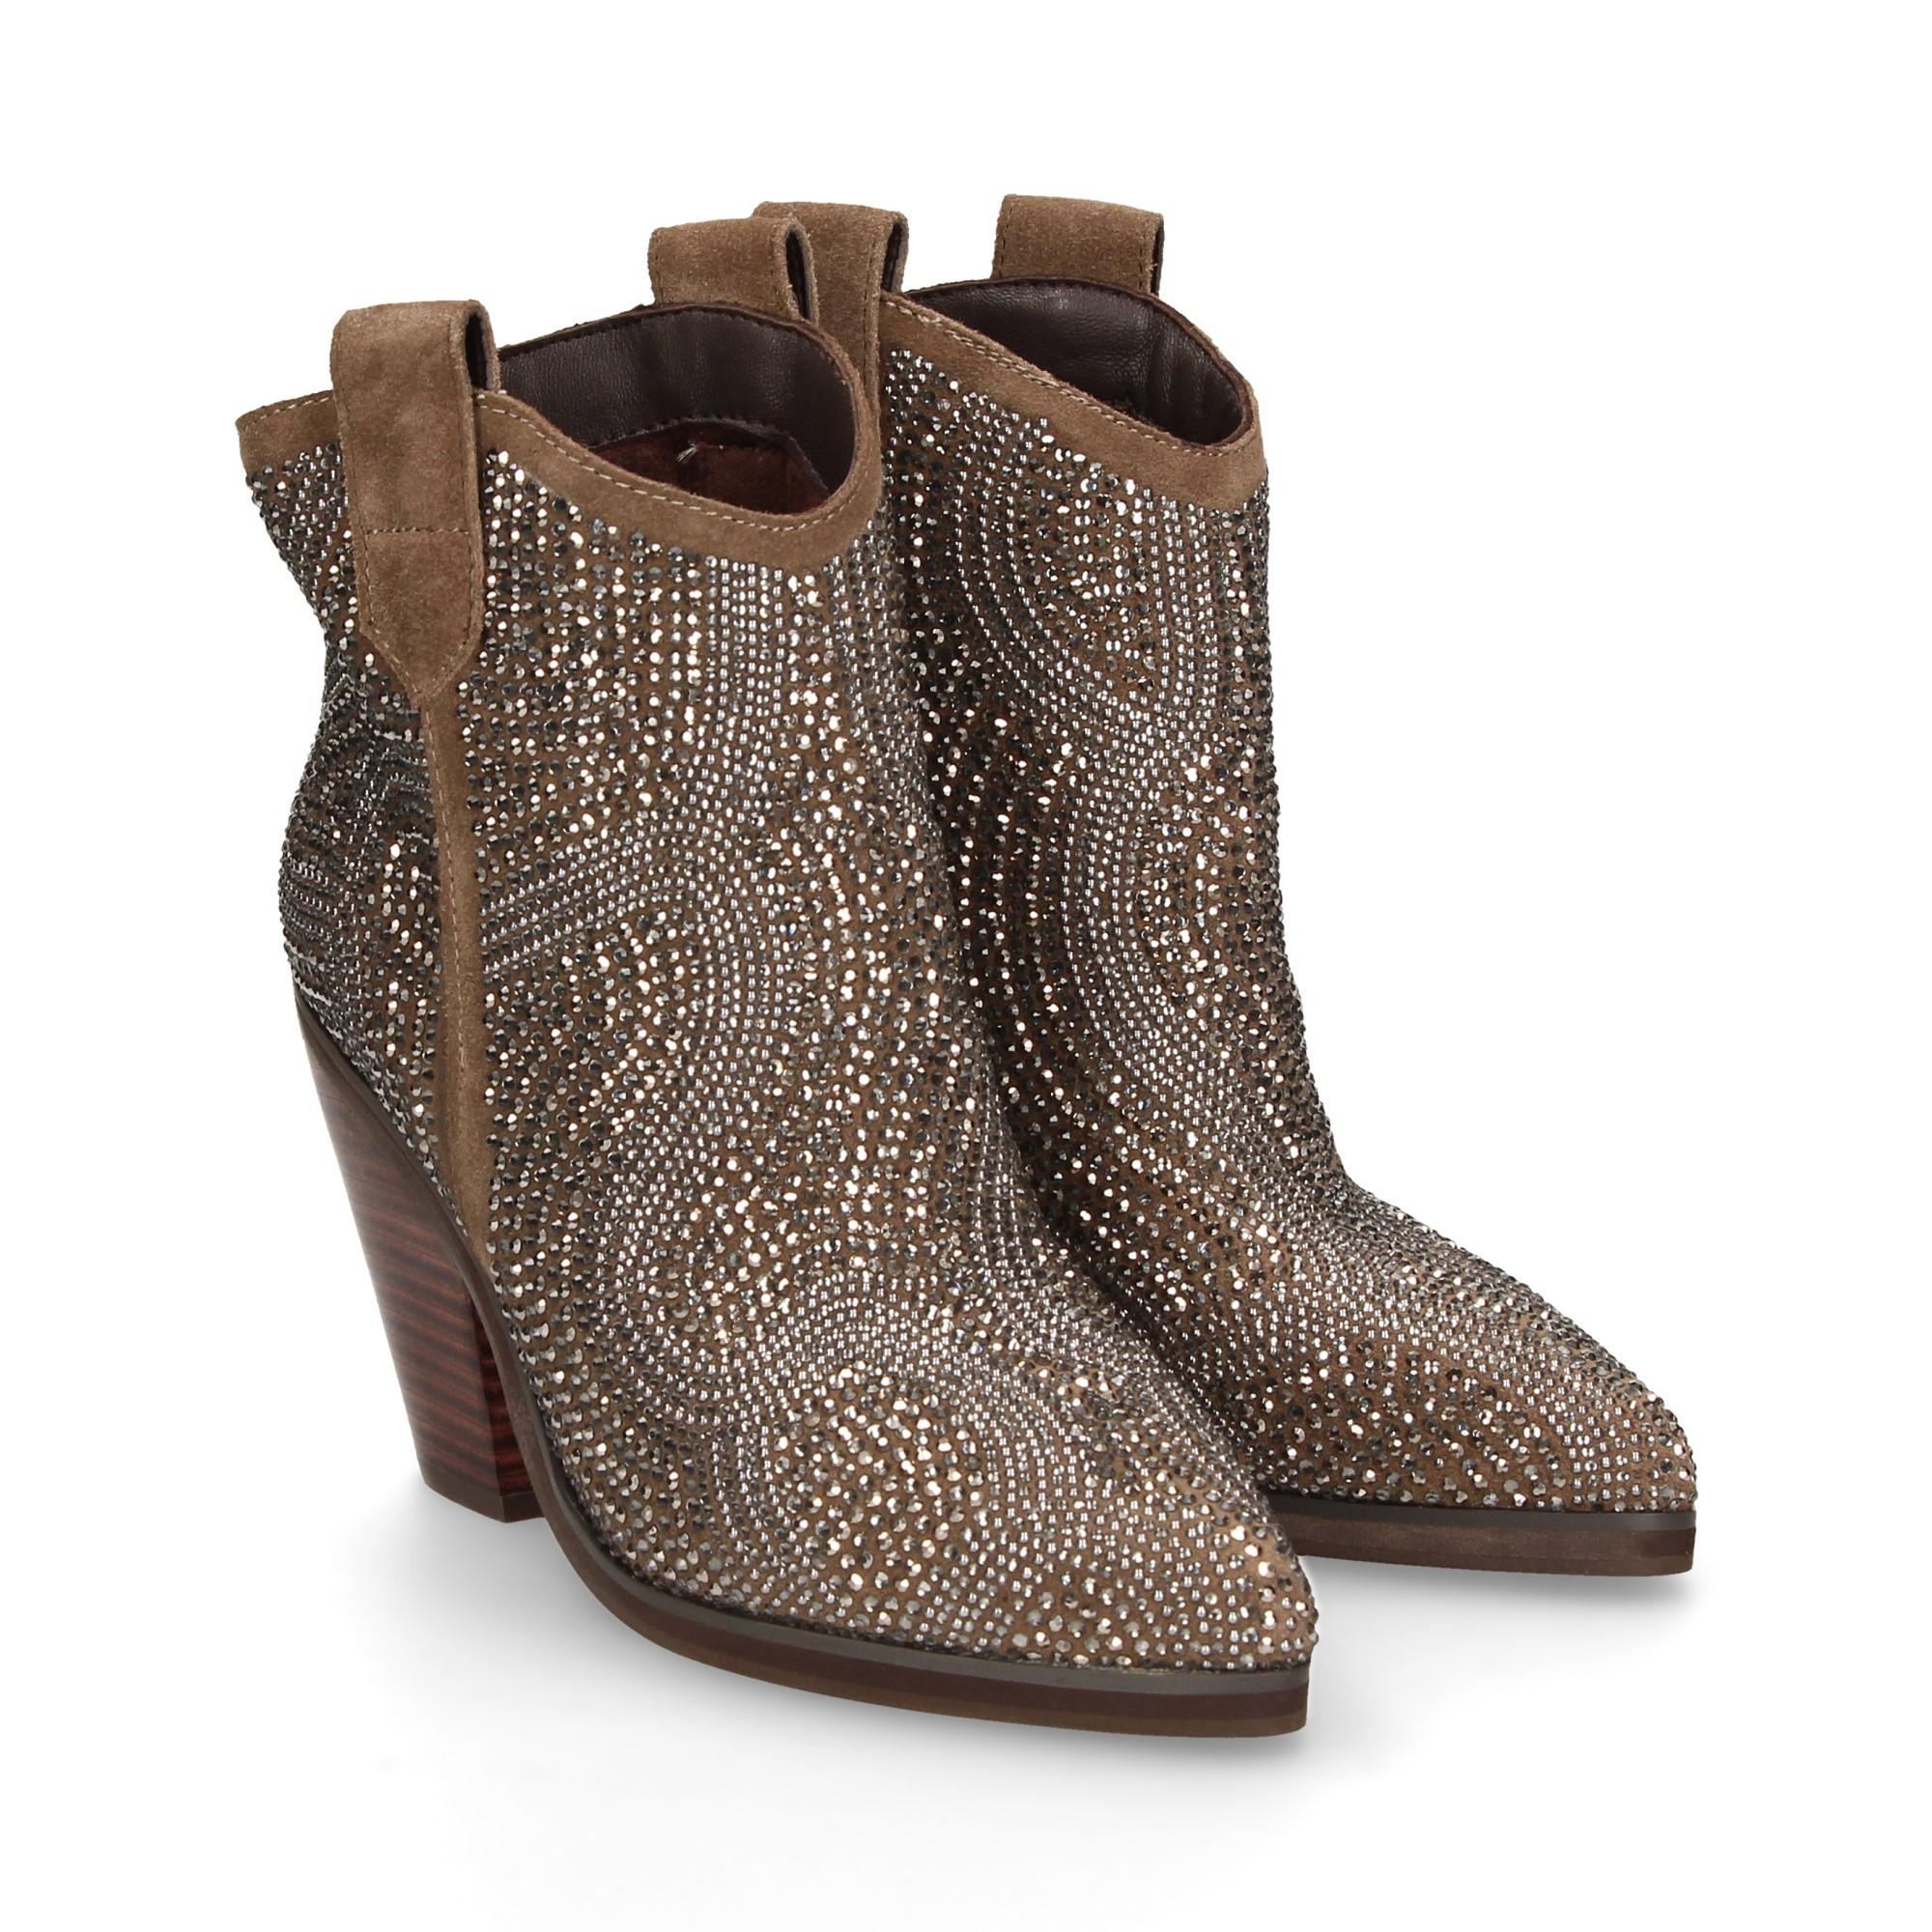 Supervivencia petróleo cerca  ALMA EN PENA Women's Heeled ankle boots 114 TAUPE